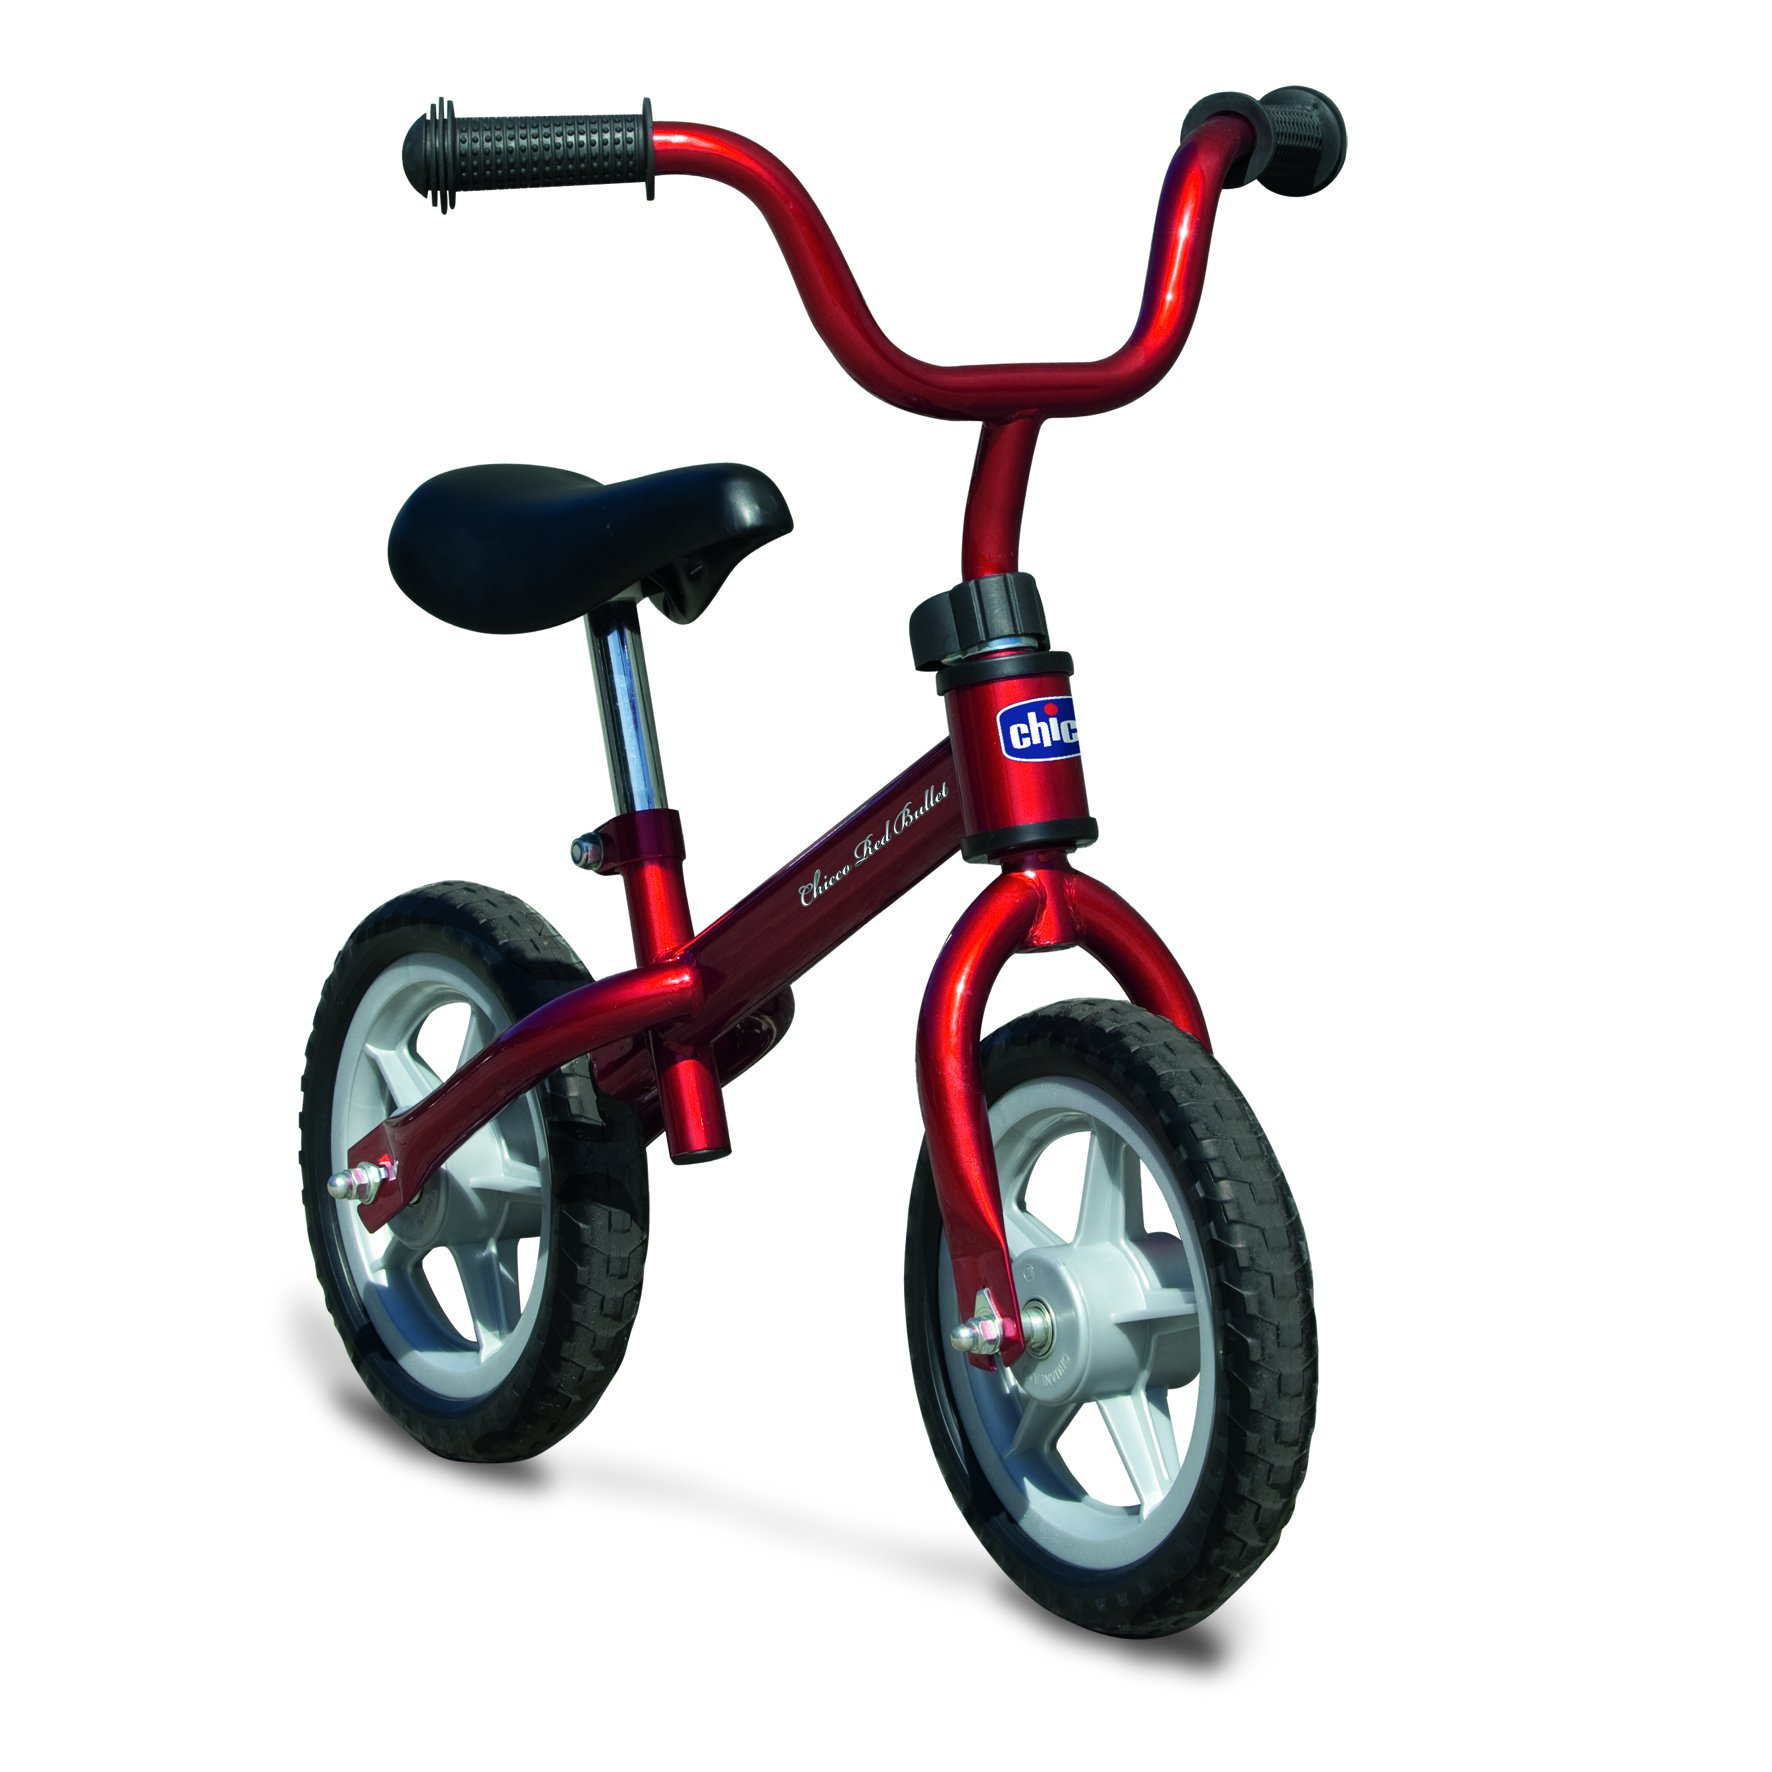 Chicco 1716000070 Red Bullet Balance Training Bike